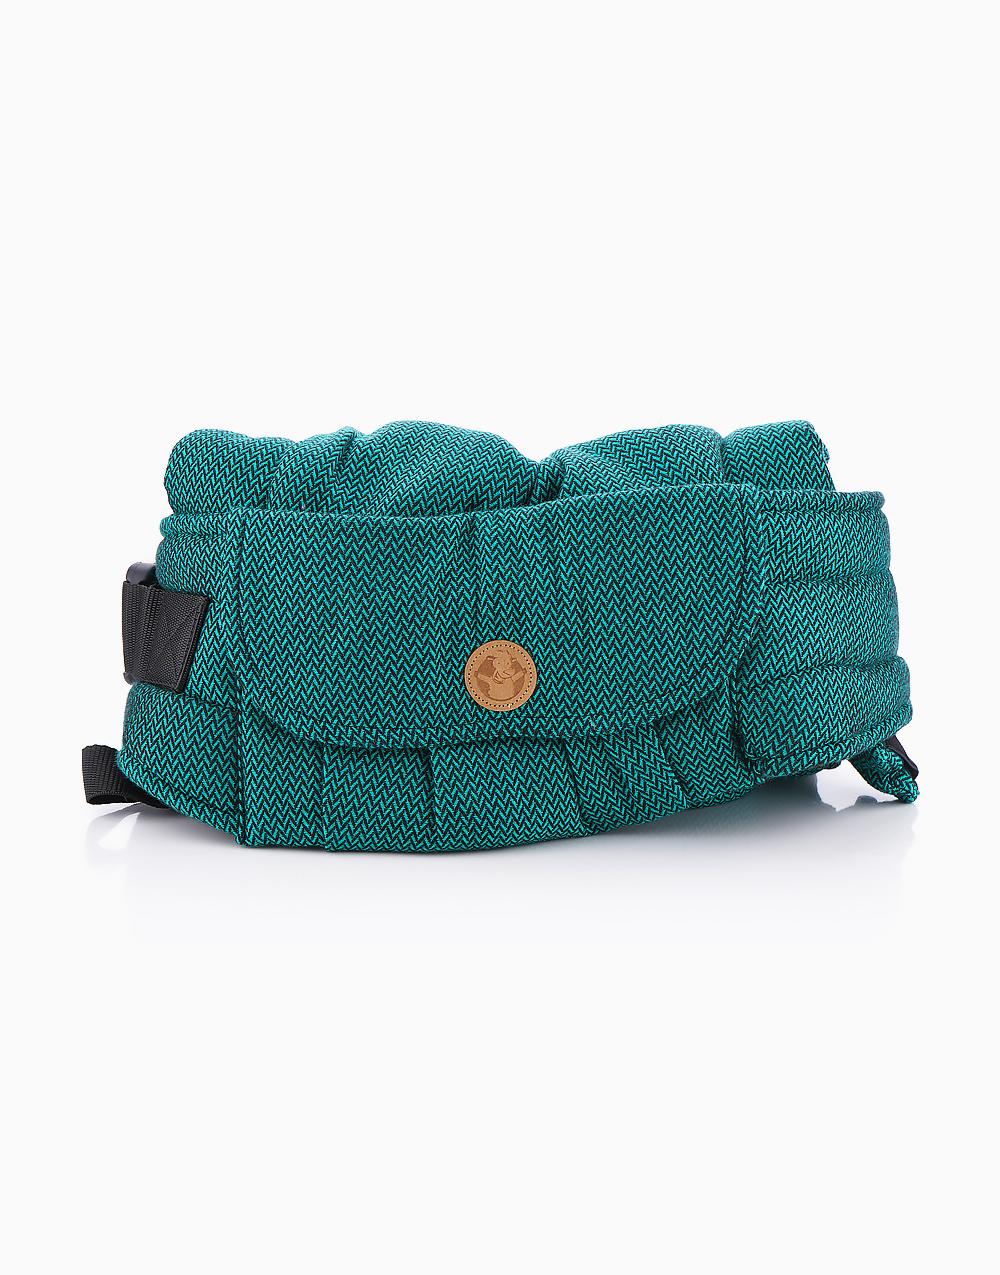 Lennyupgrade Adjustable Baby Carrier (Emerald) by Lennylamb